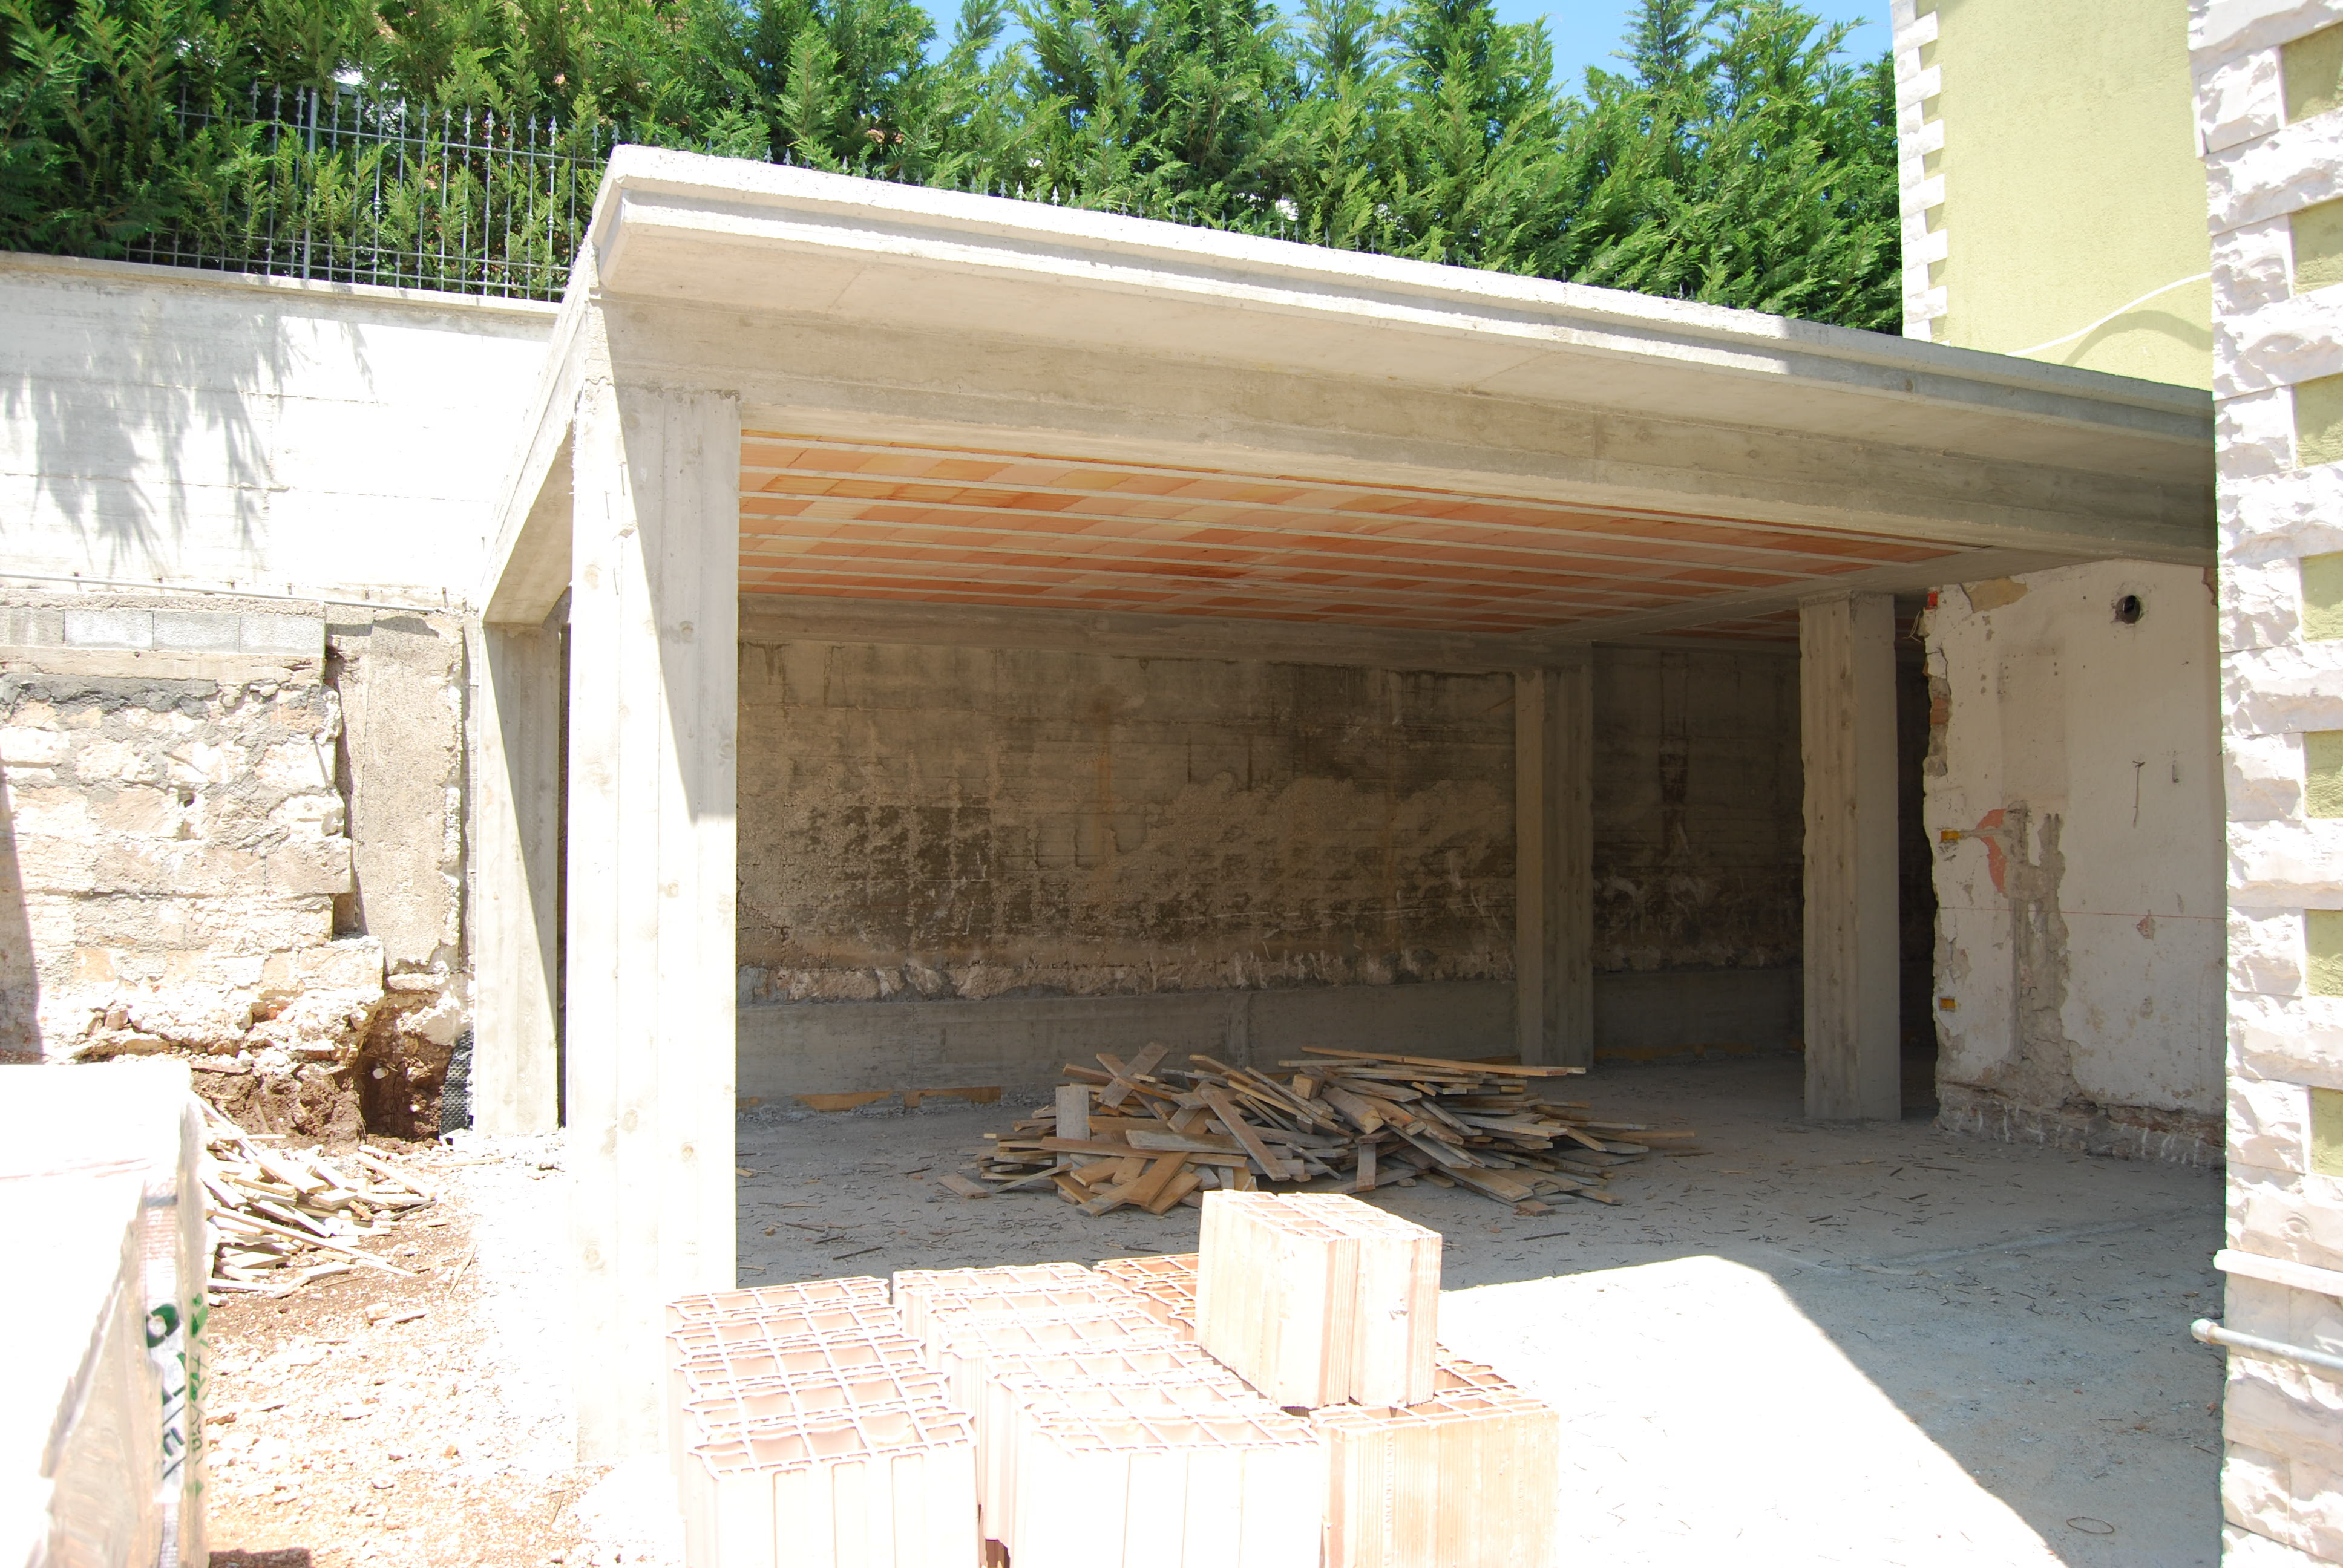 Trendy filecasa in costruzione with costruzione casa - Mutuo casa in costruzione ...